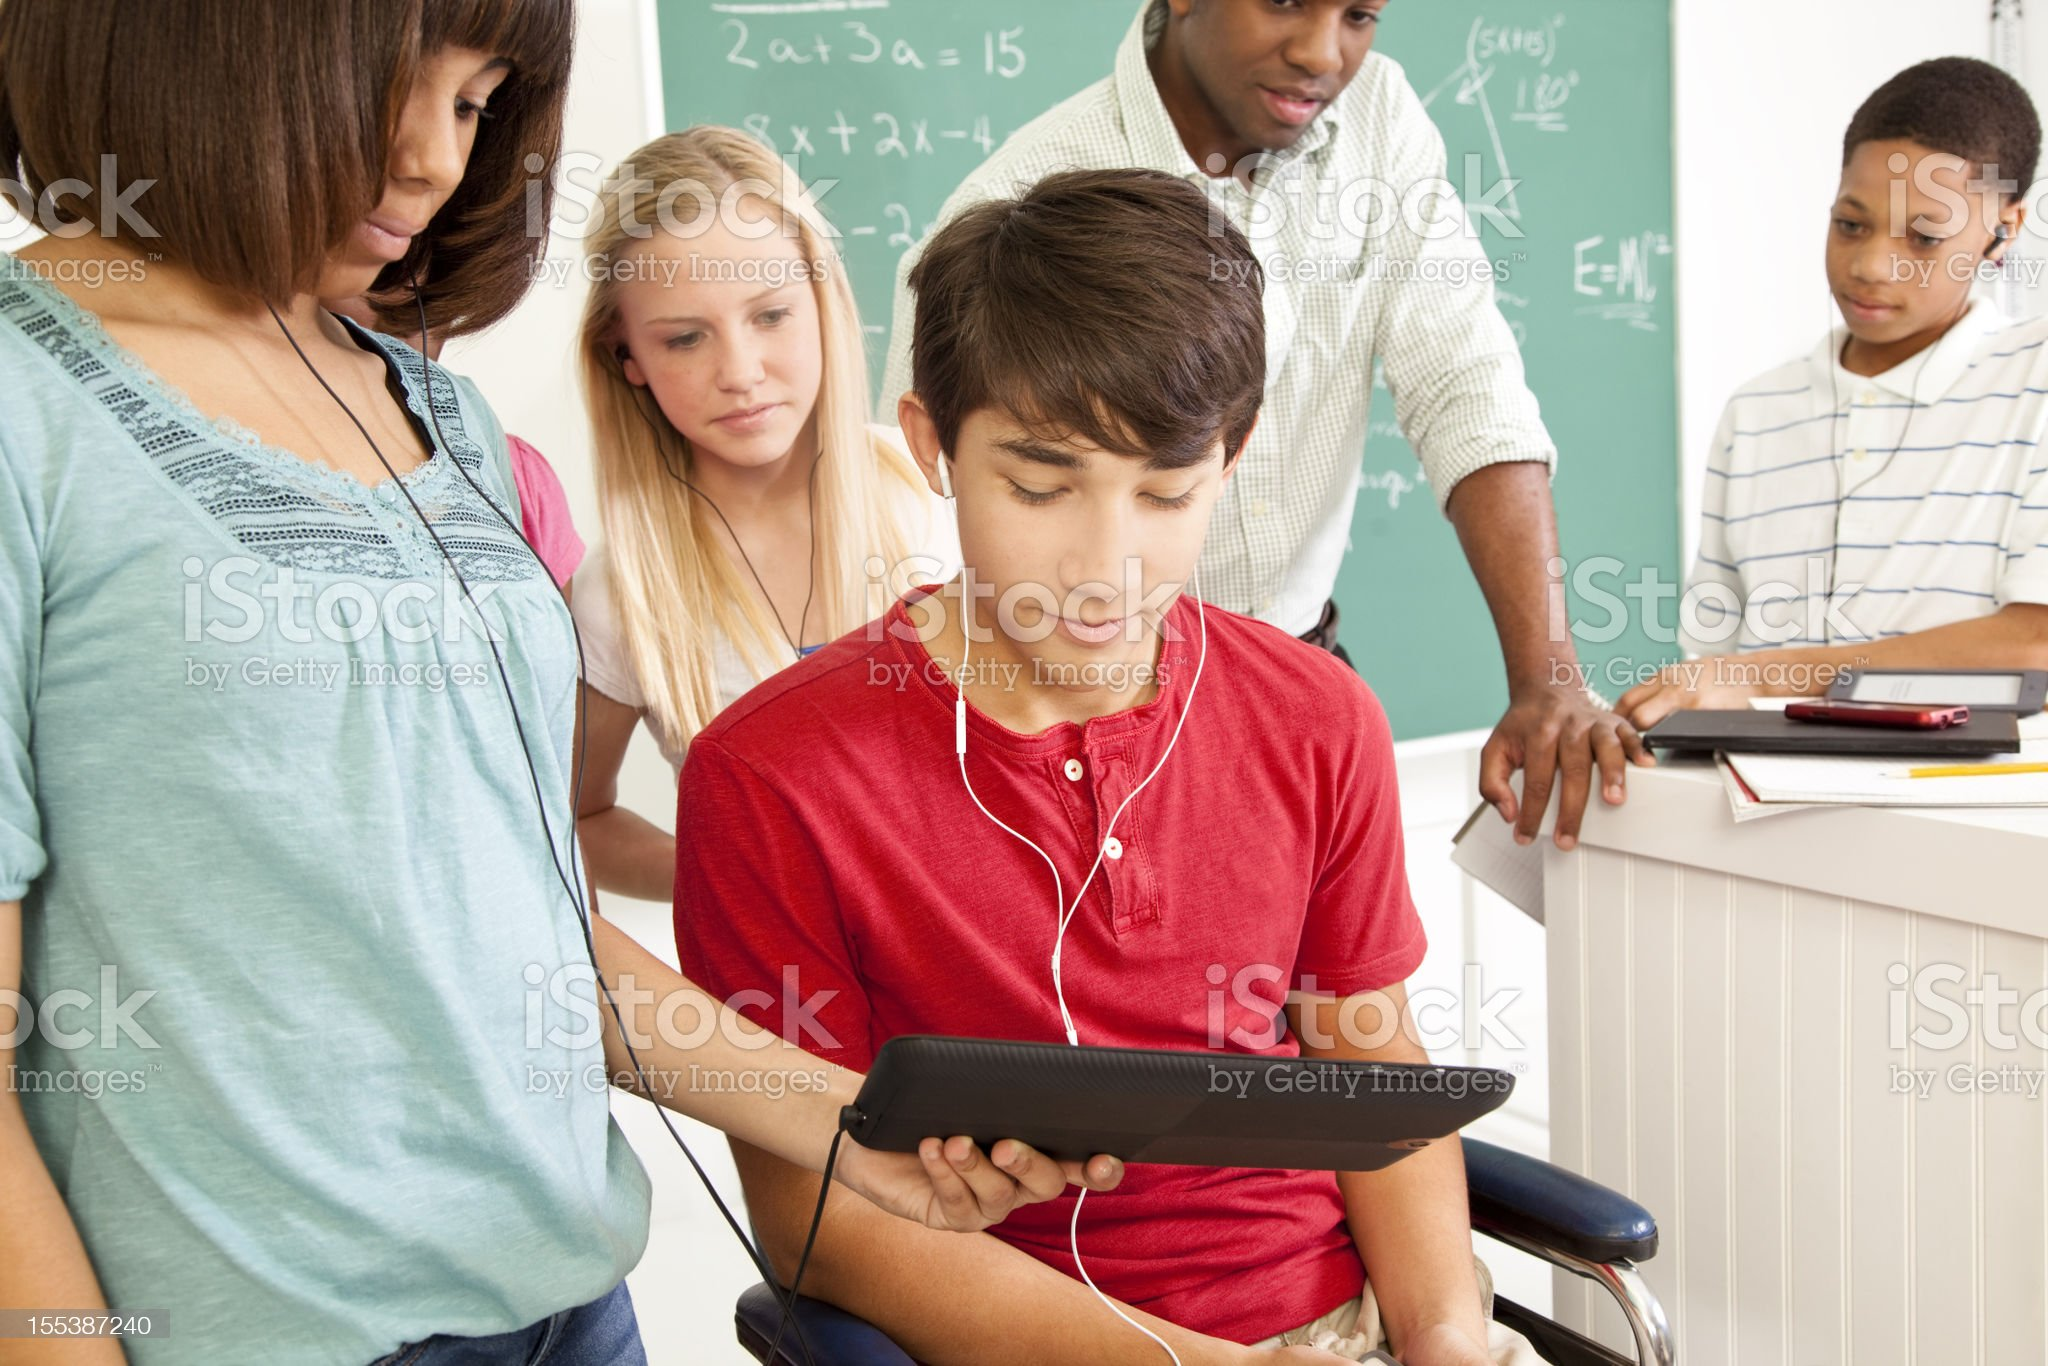 Students, teacher math classroom. Technology. Digital tablet. Child in wheelchair. royalty-free stock photo